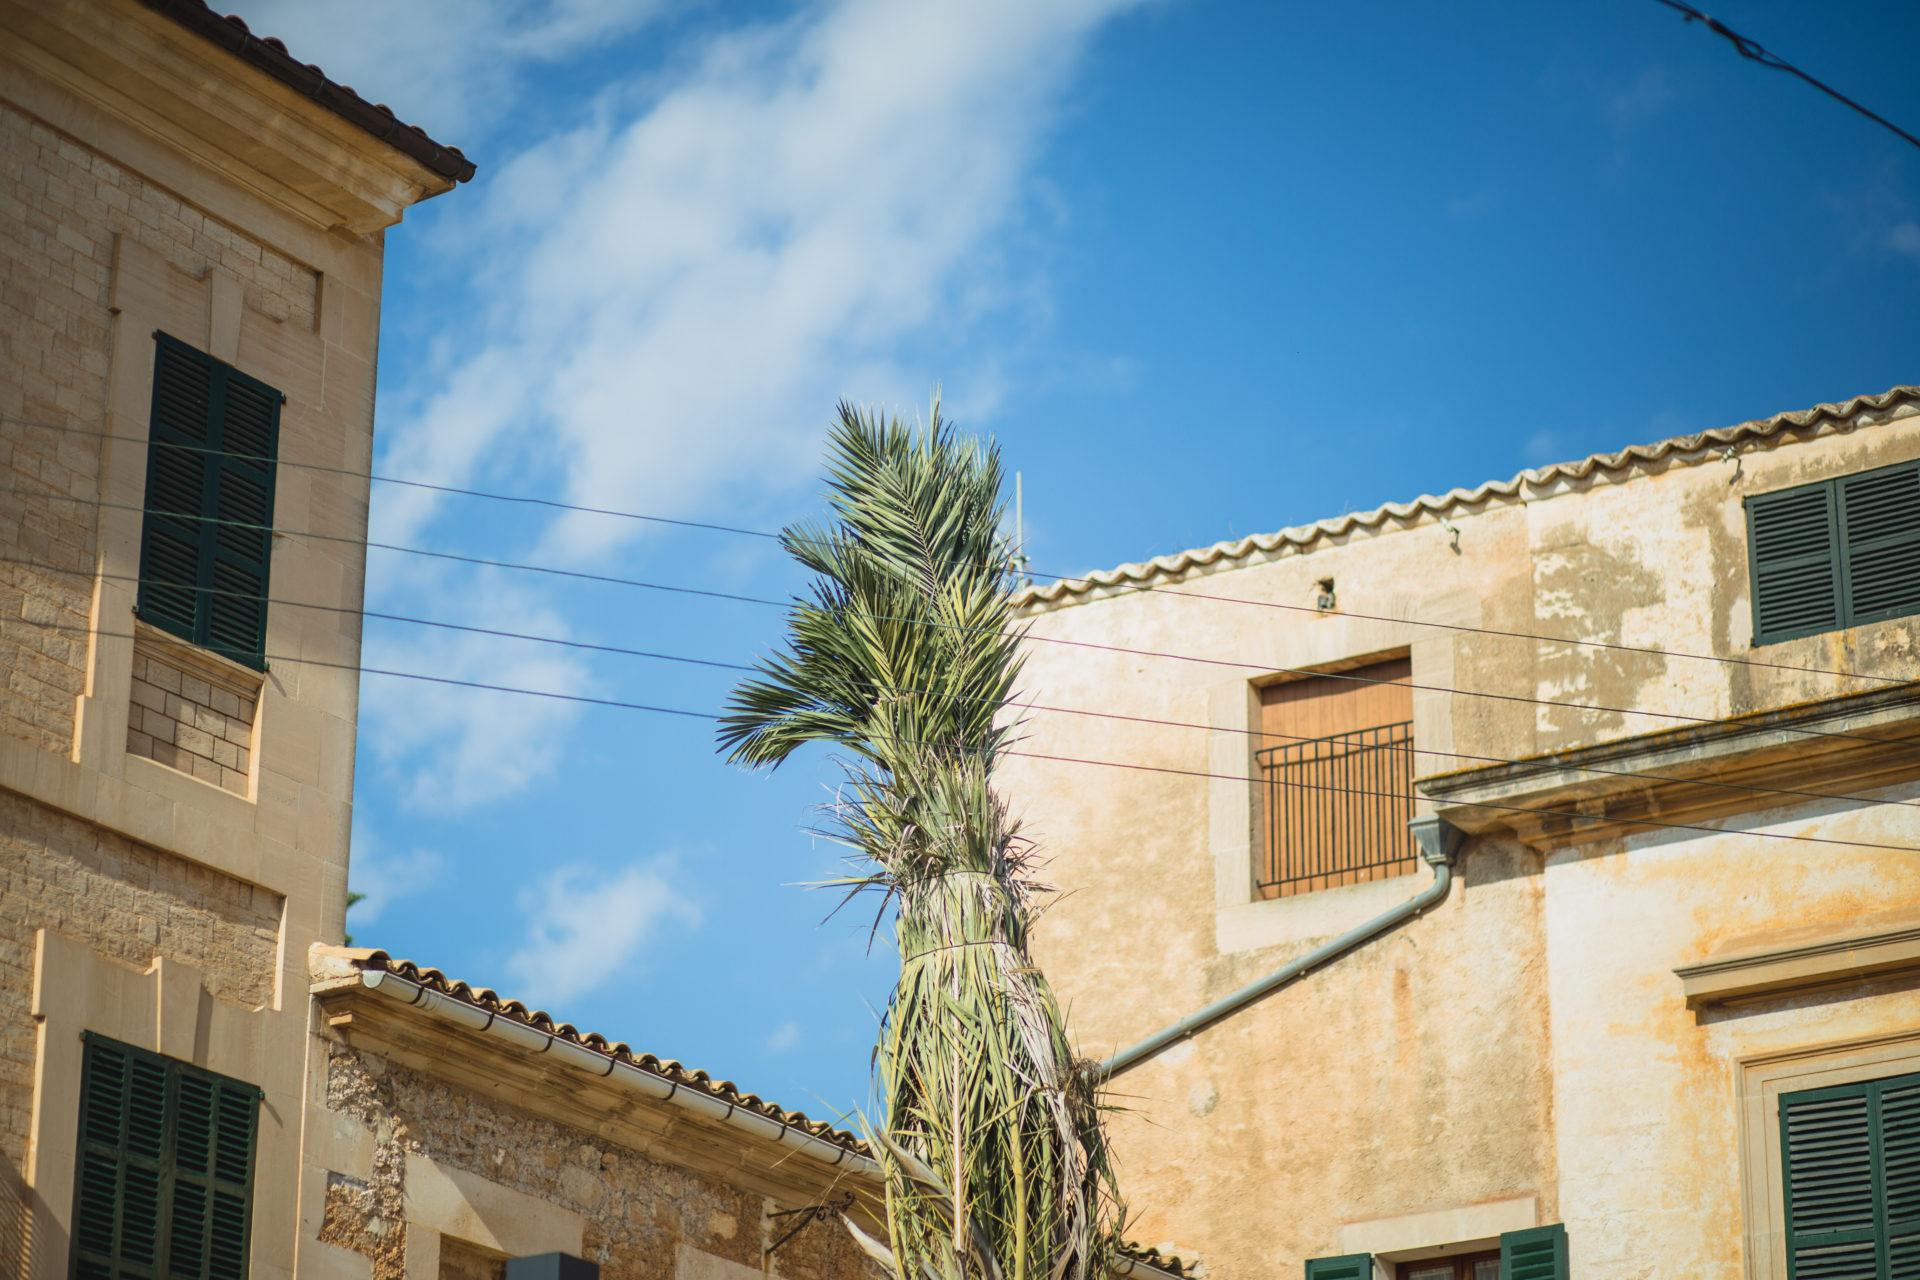 Mallorca_IMG_3434_Carolin-Weinkopf